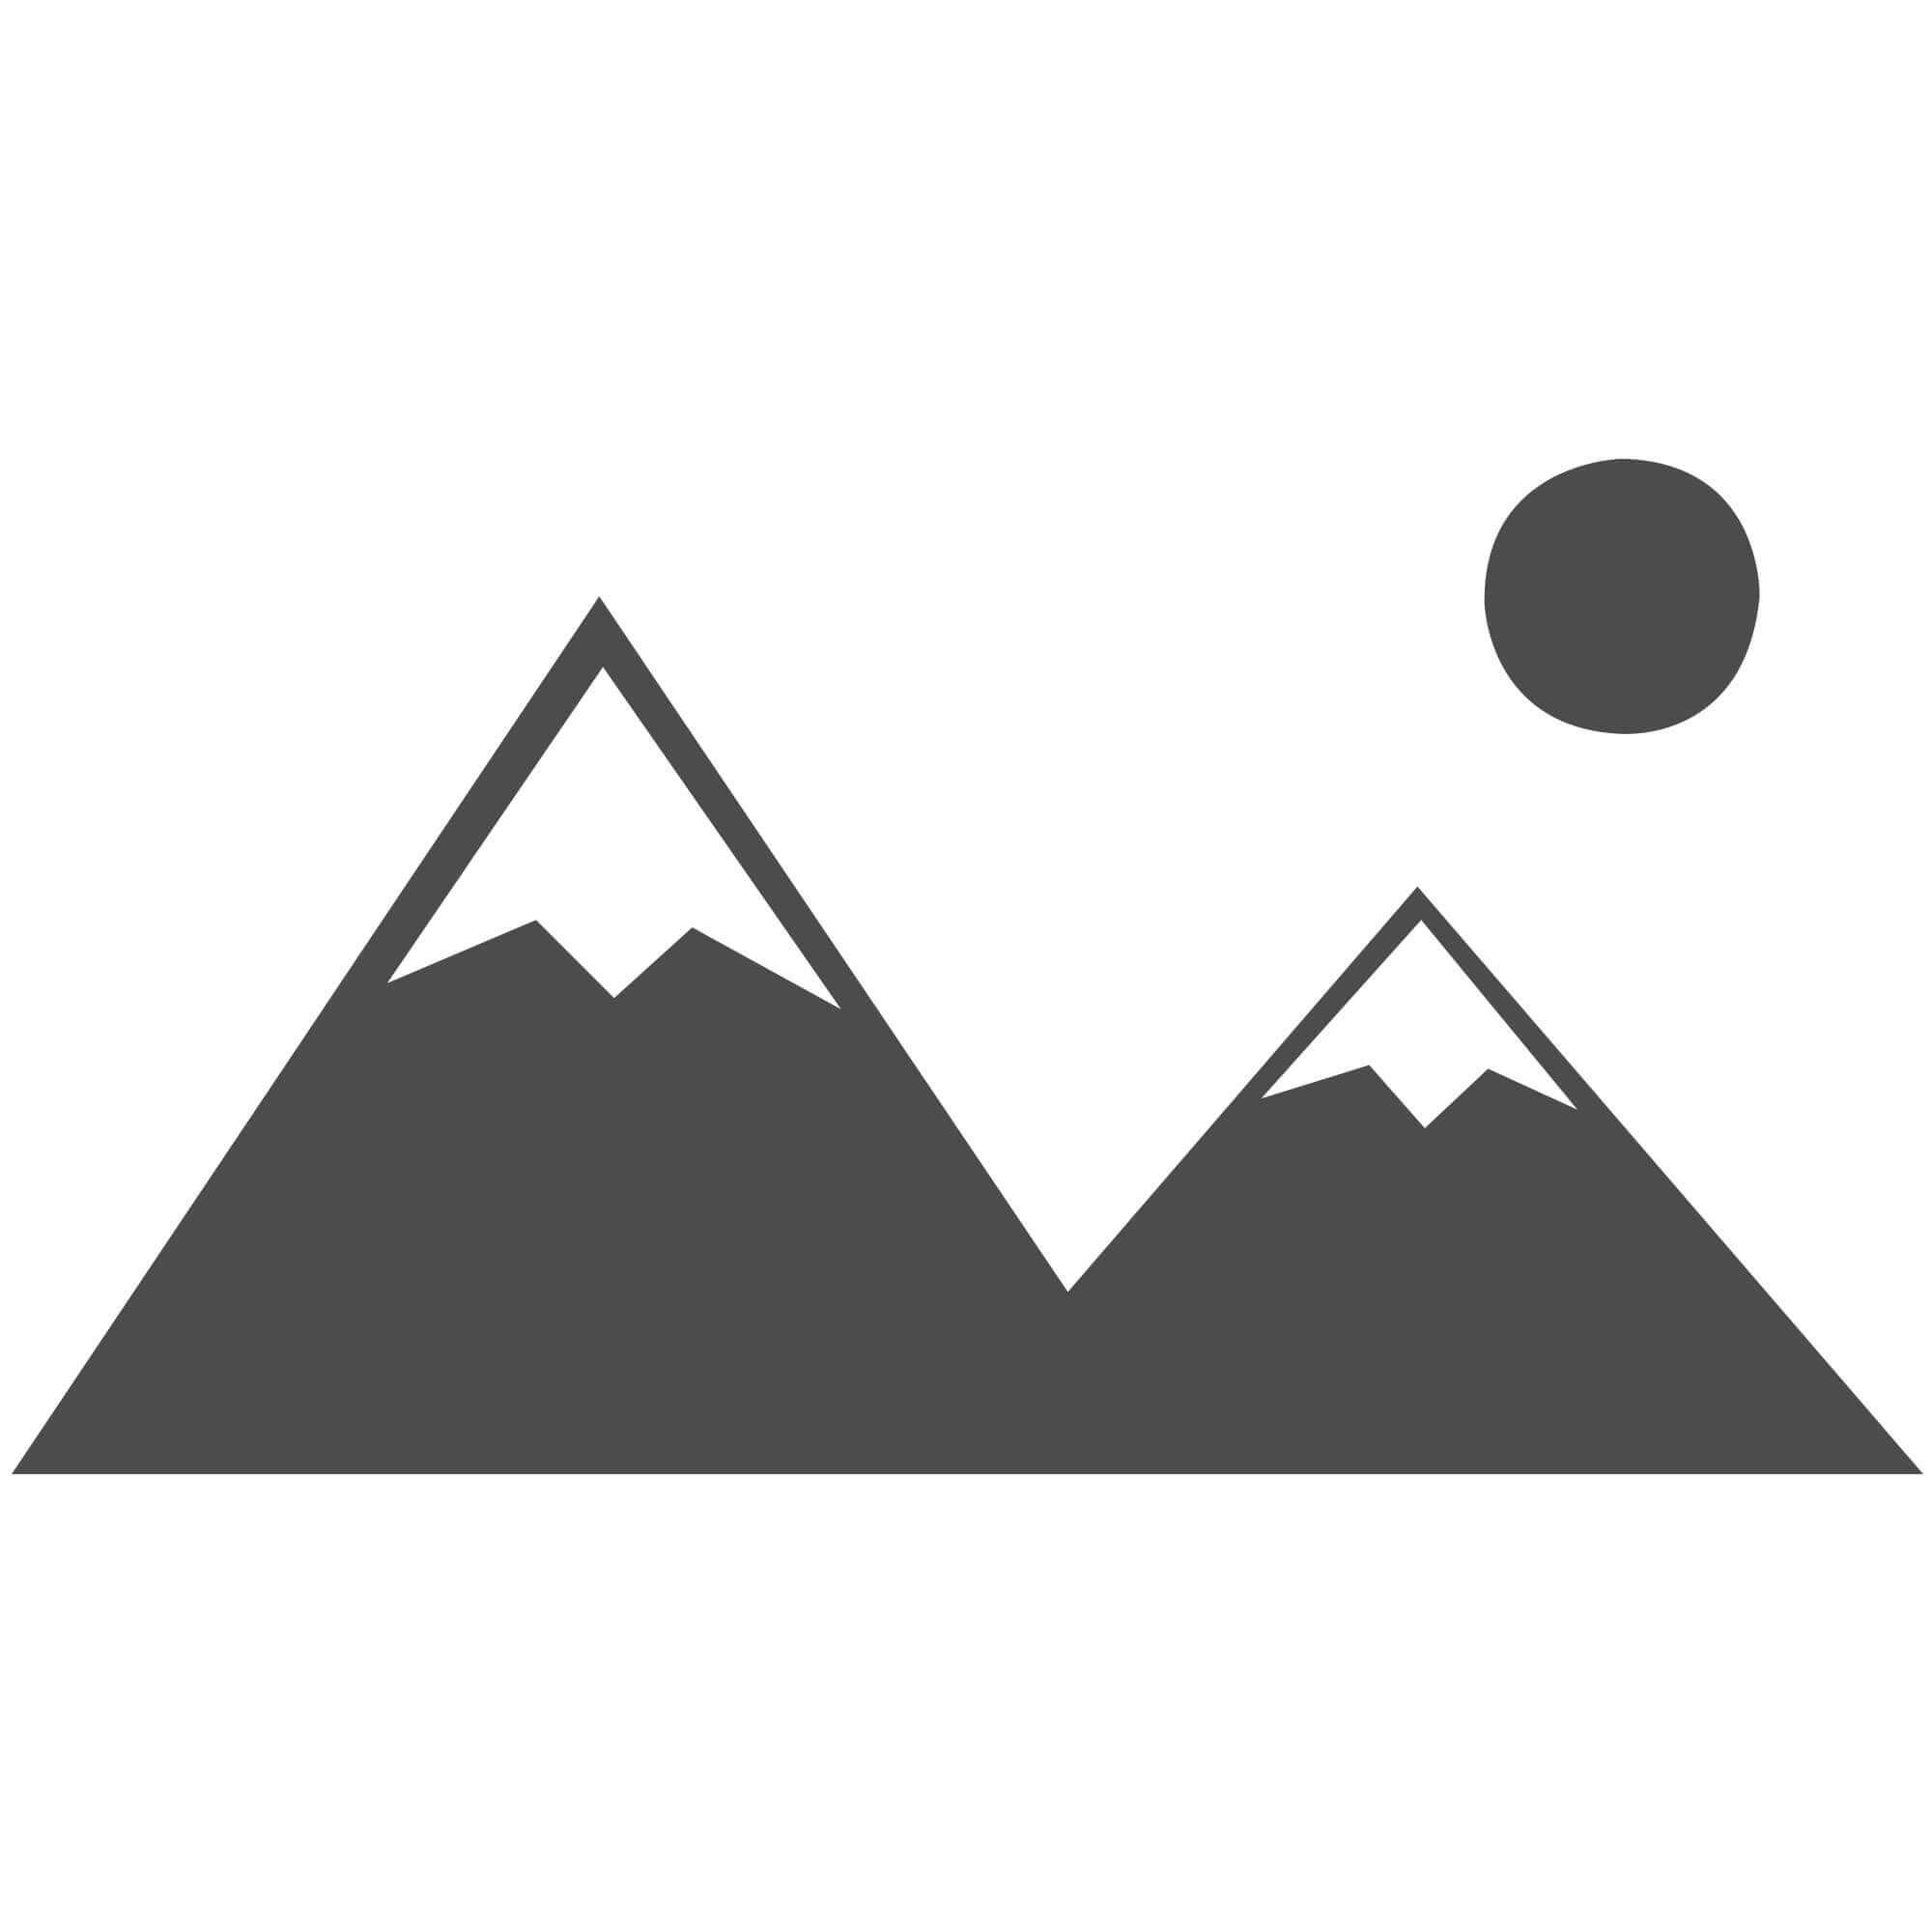 "Riley Geometric Rug - RL06 Pink / Grey - Size 120 x 170 cm (4' x 5'7"")"